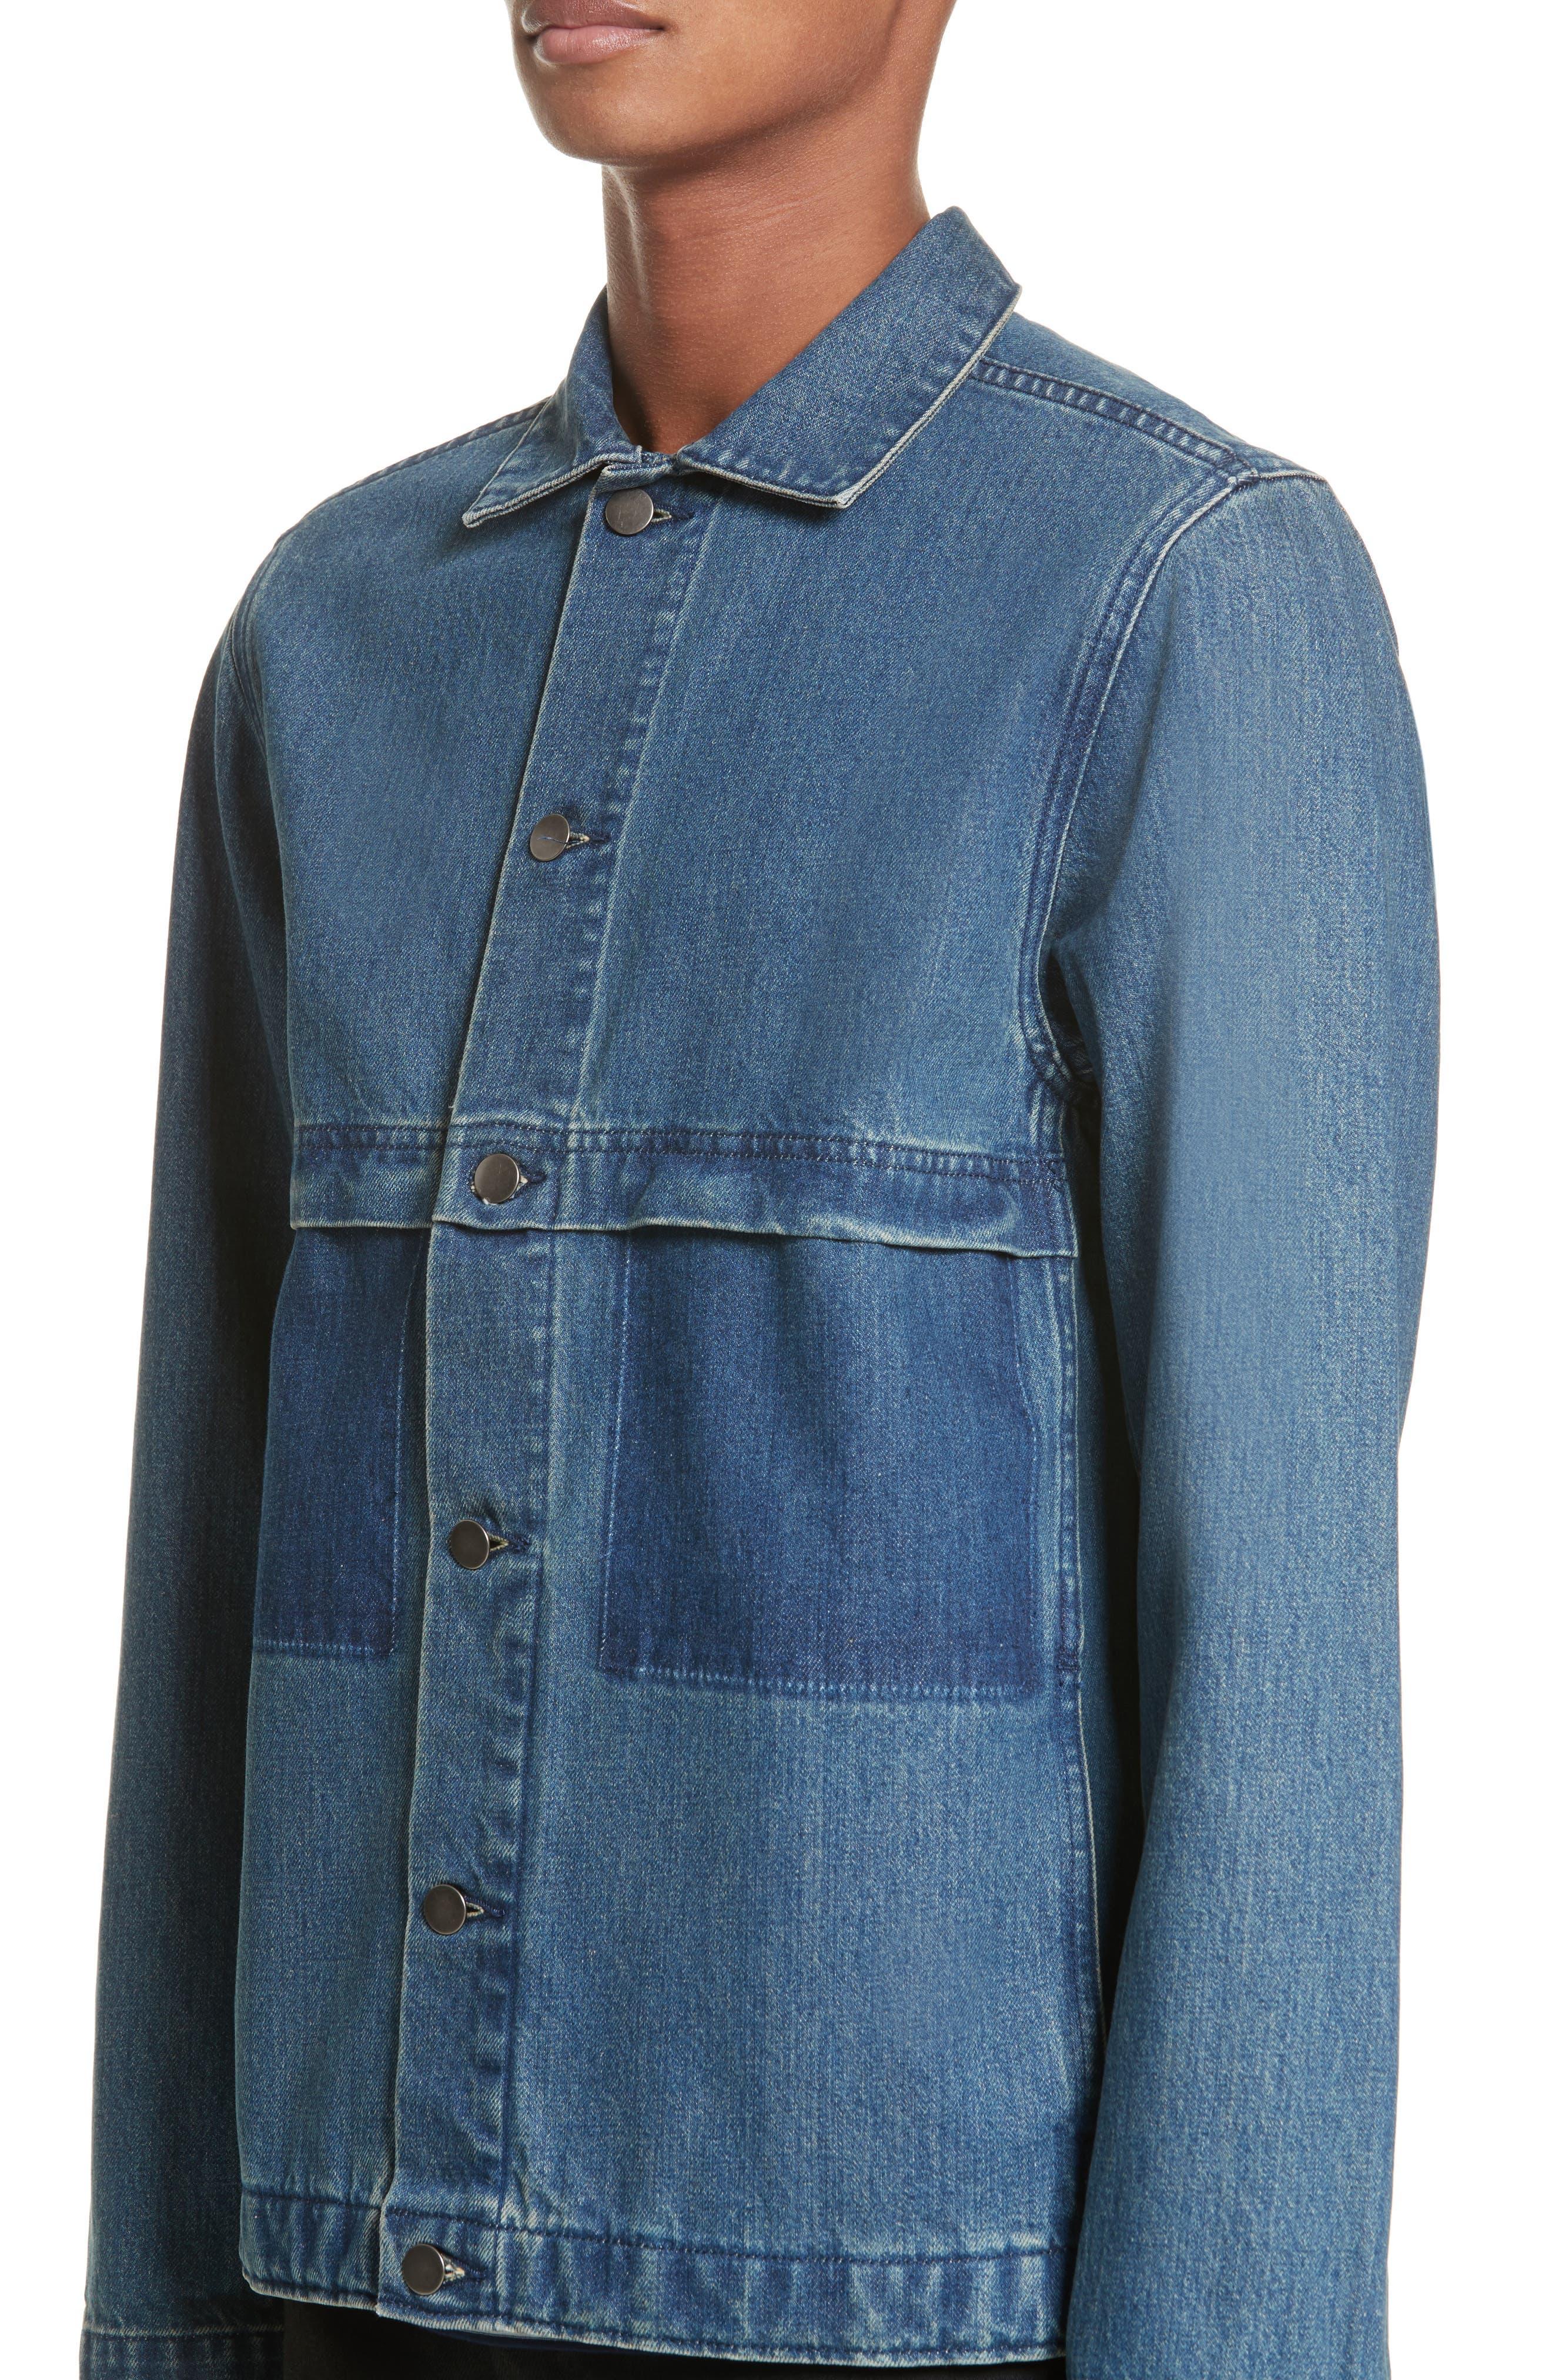 Smith Denim Jacket,                             Alternate thumbnail 4, color,                             Indigo Delave Ial